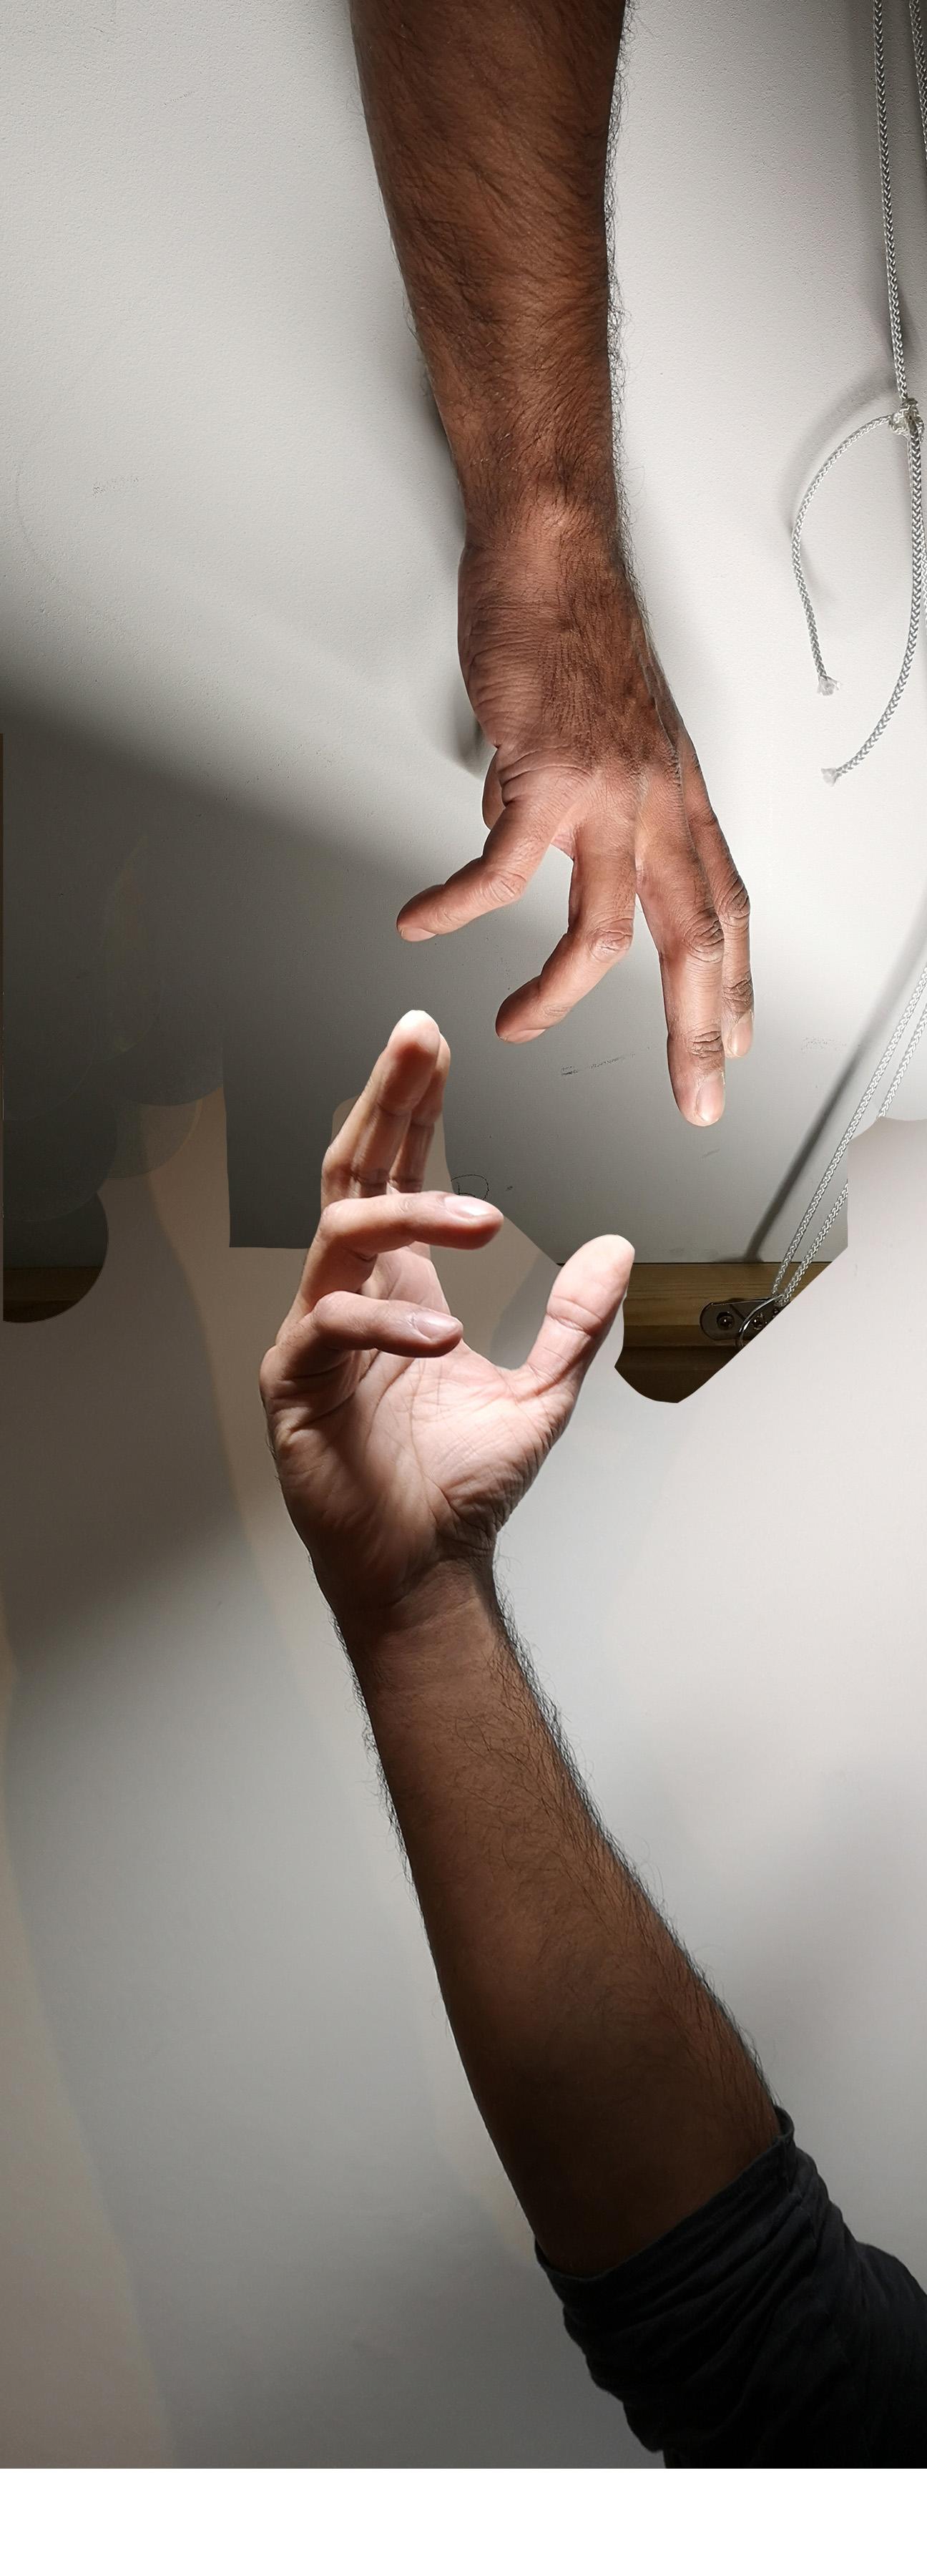 reaching hands.jpg